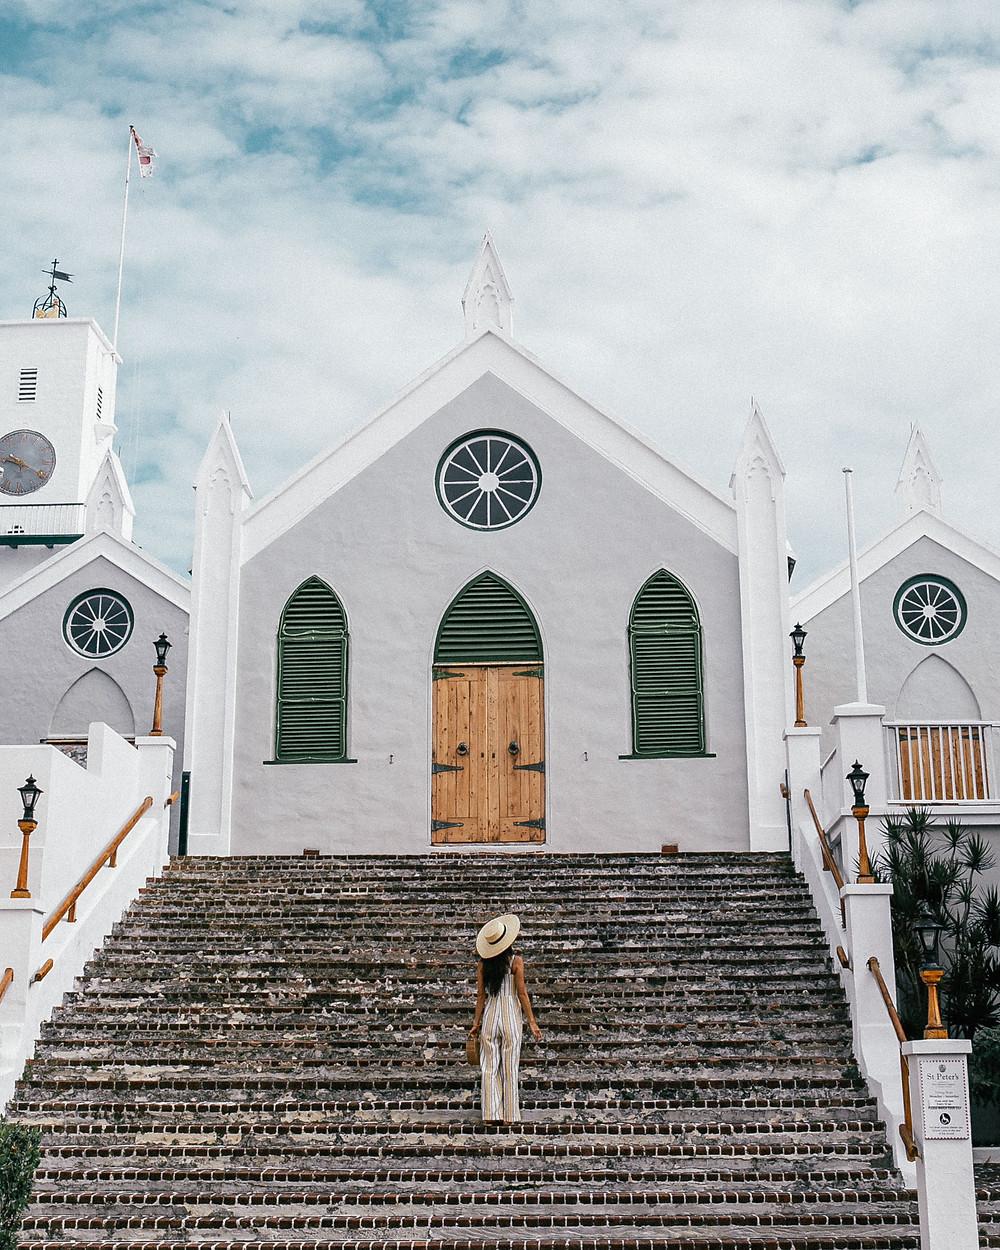 St. Peter's Church, St. George's Parish, Bermuda